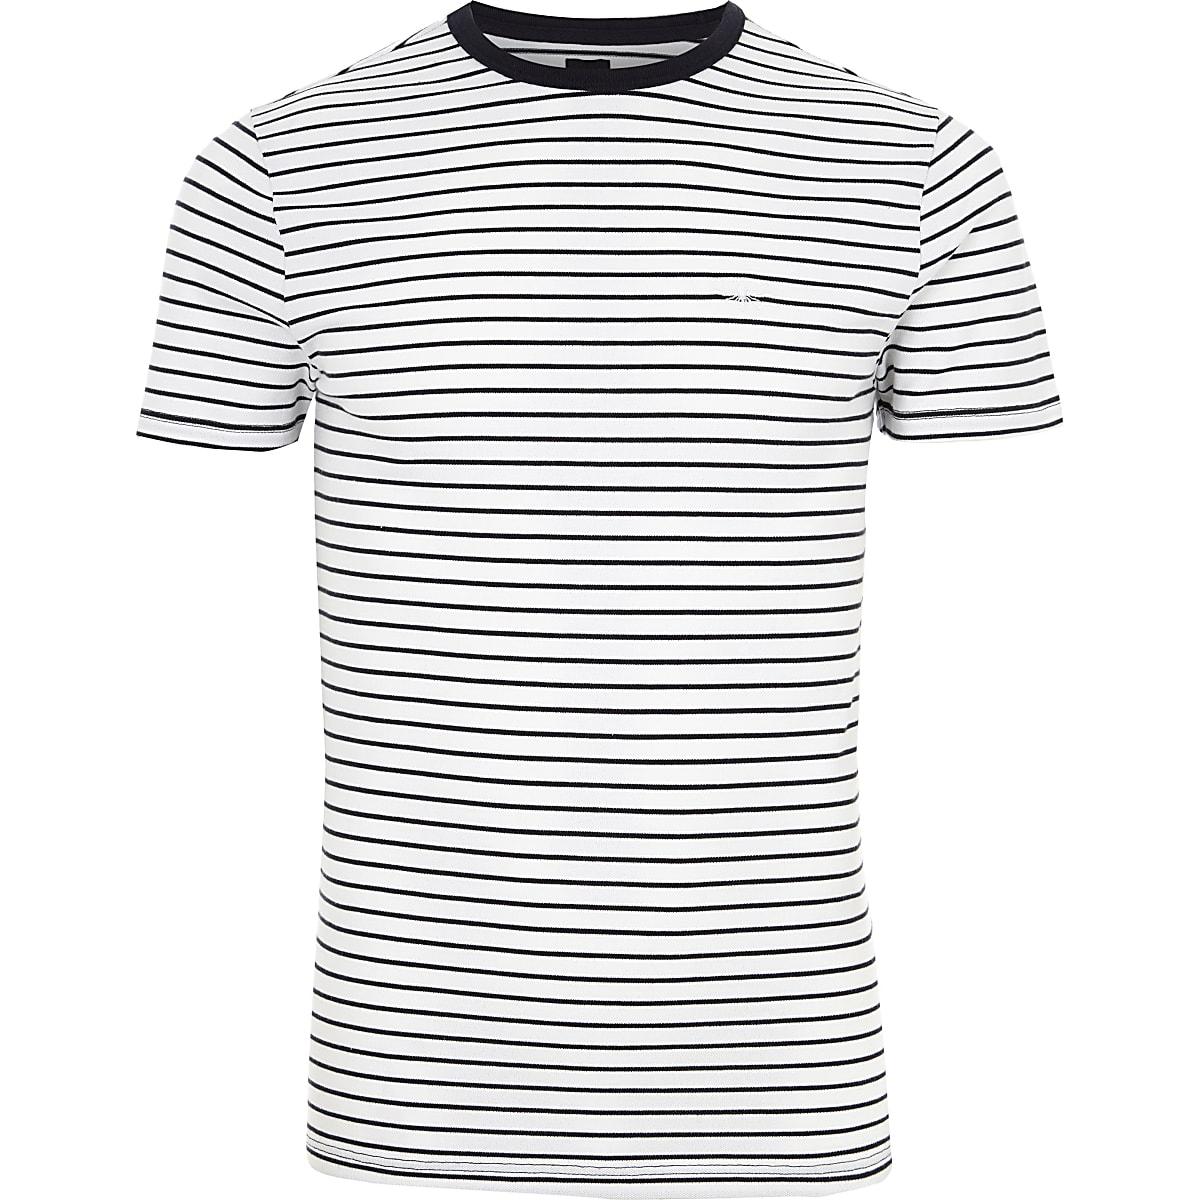 cfbba59b7 White stripe muscle fit crew neck T-shirt - T-shirts - T-Shirts ...